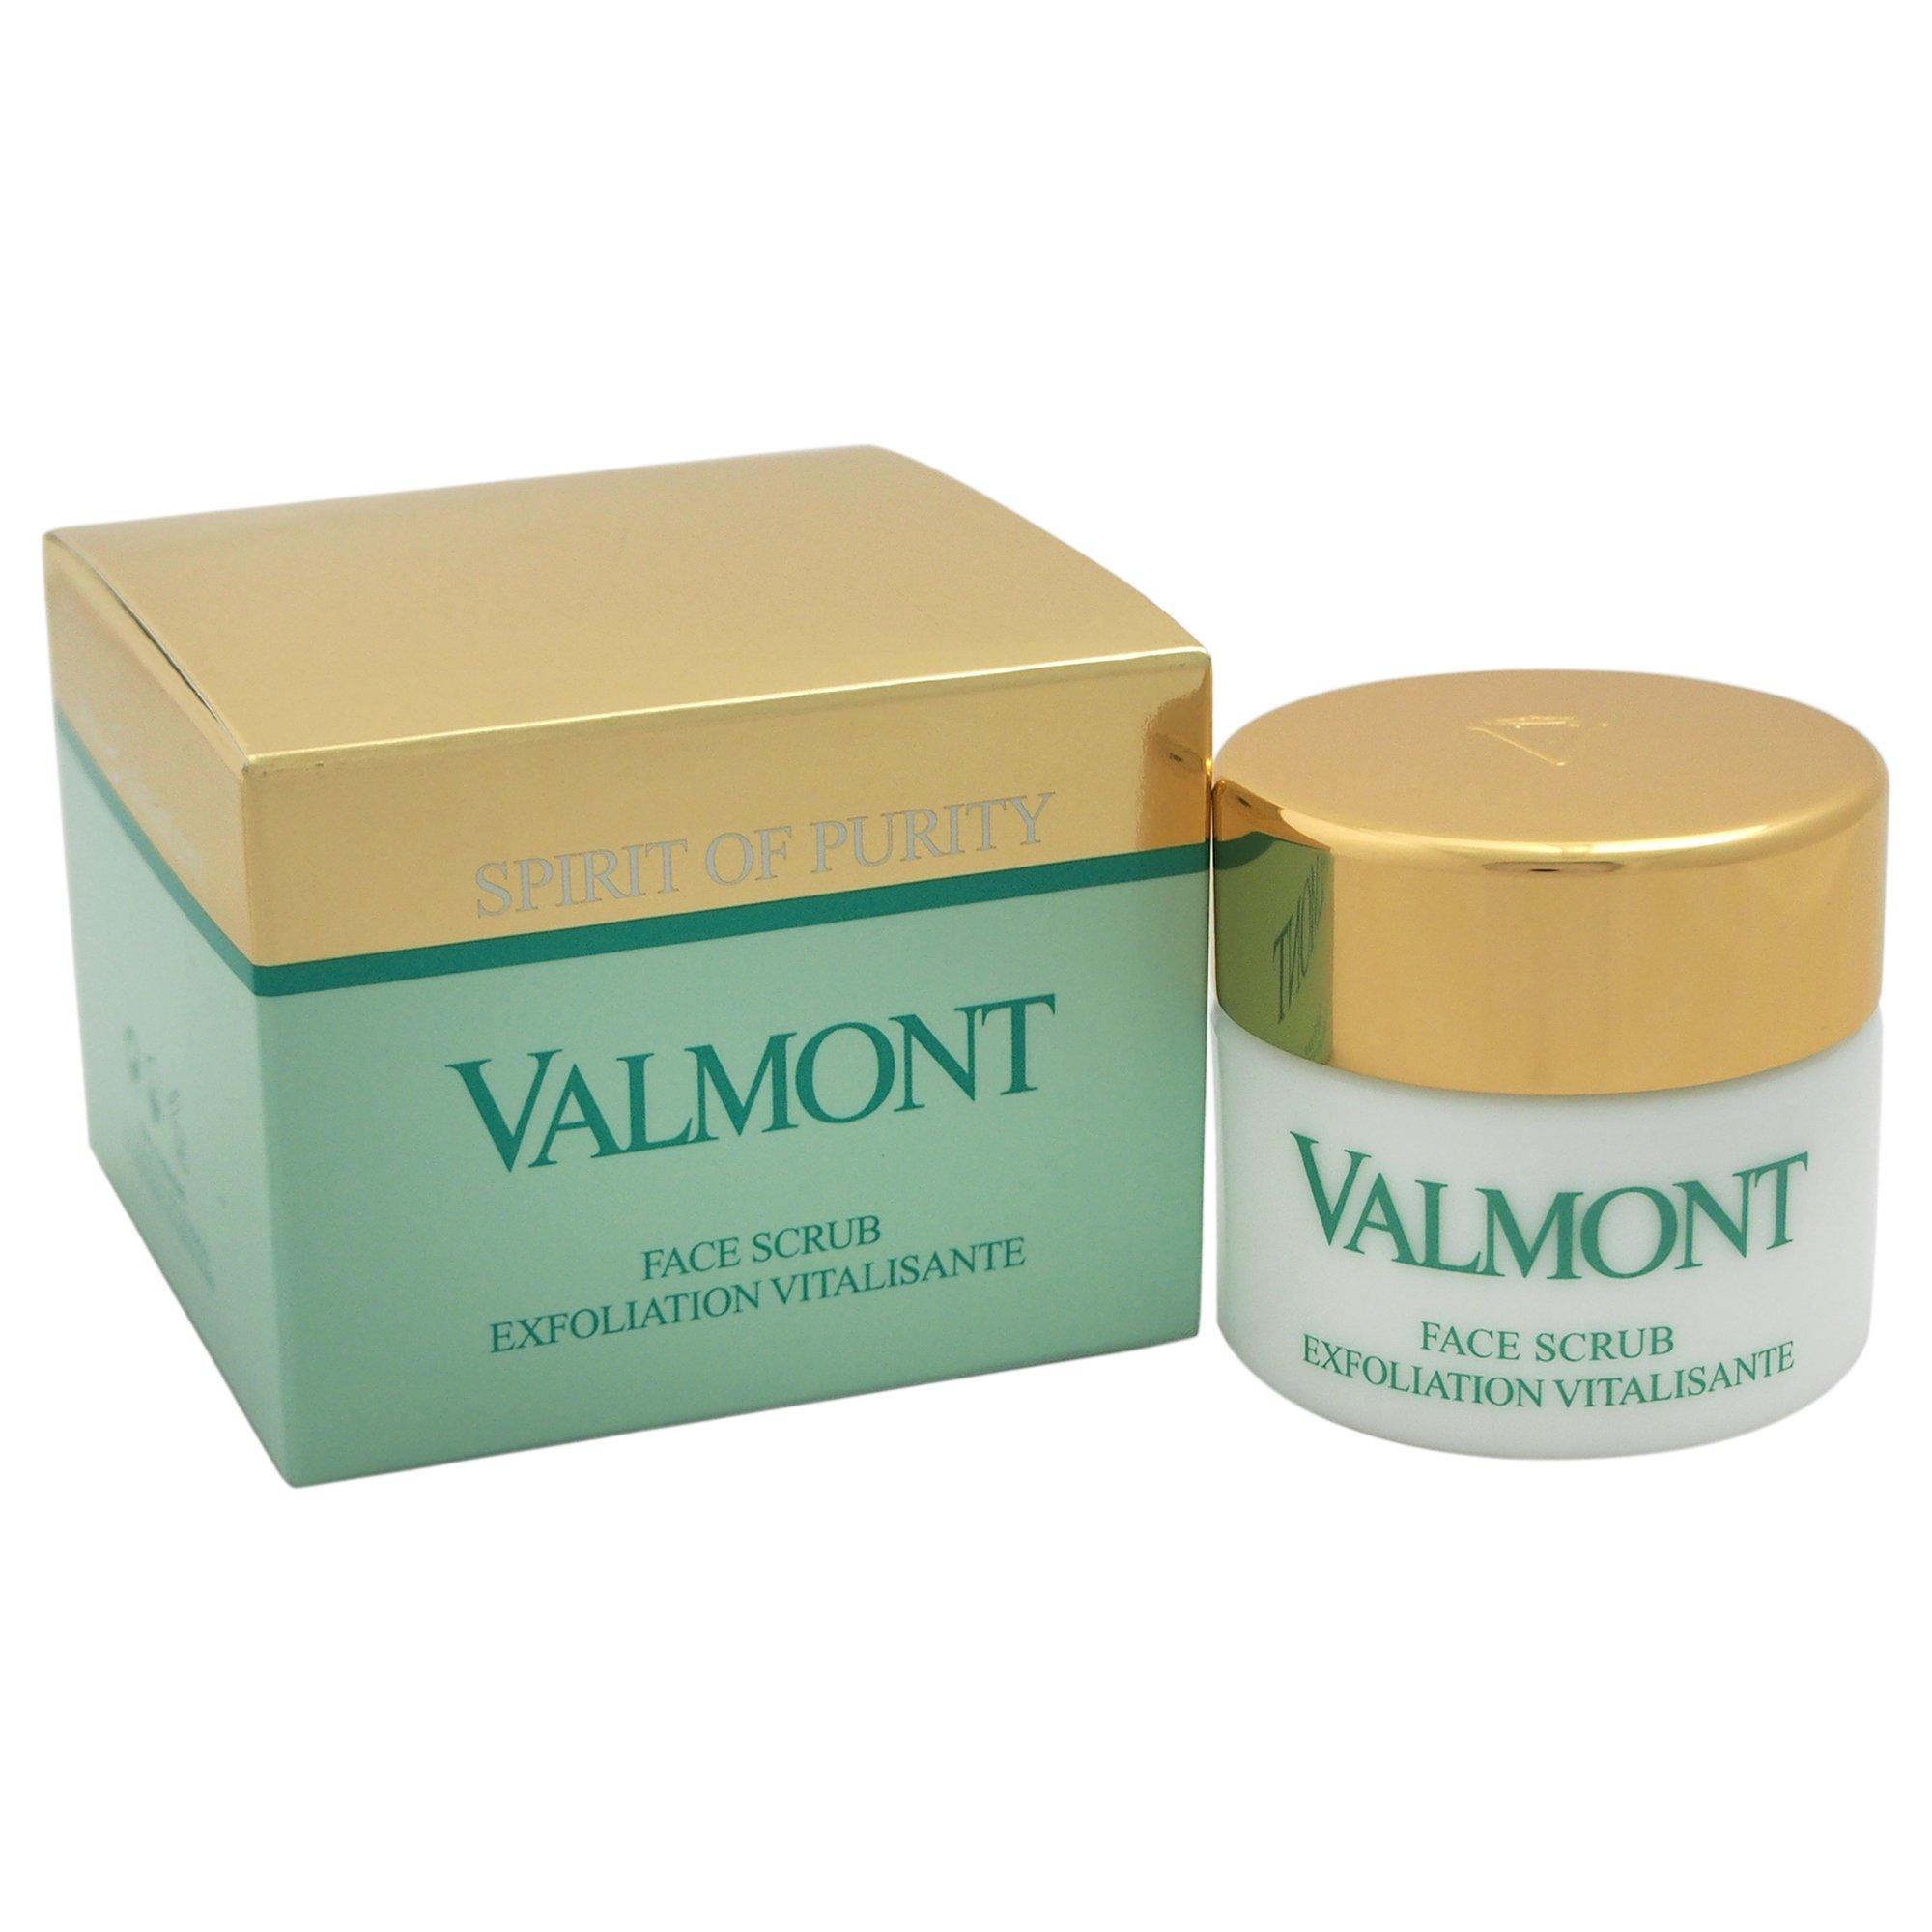 Valmont Purification Ritual Face Scrub, 1.7 Fluid Ounce